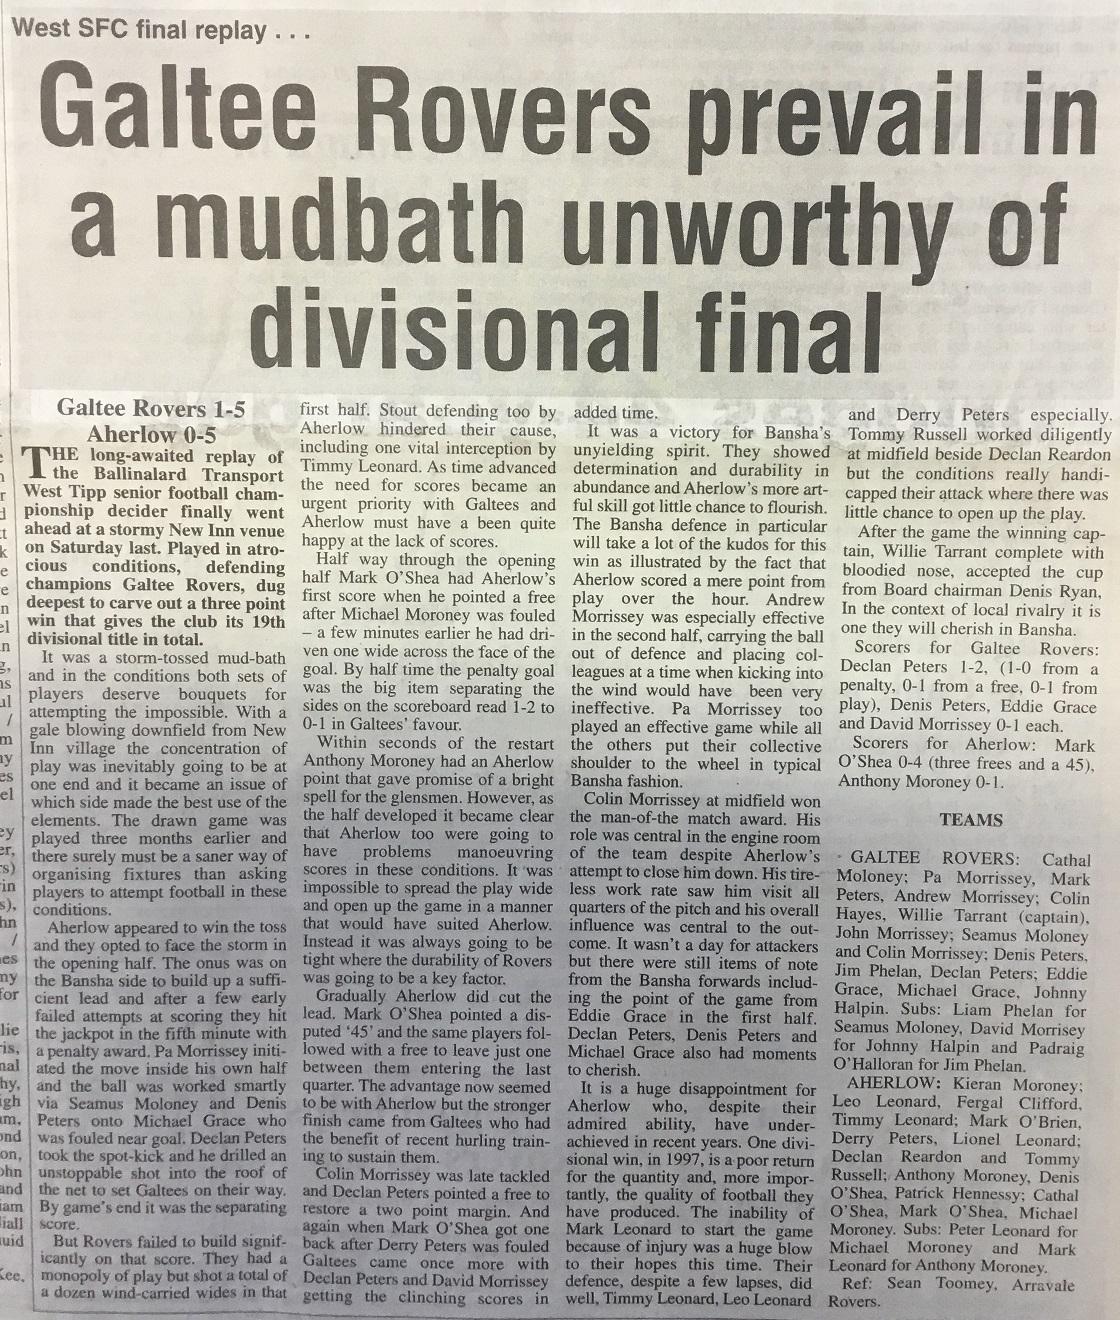 2000 West football final replay